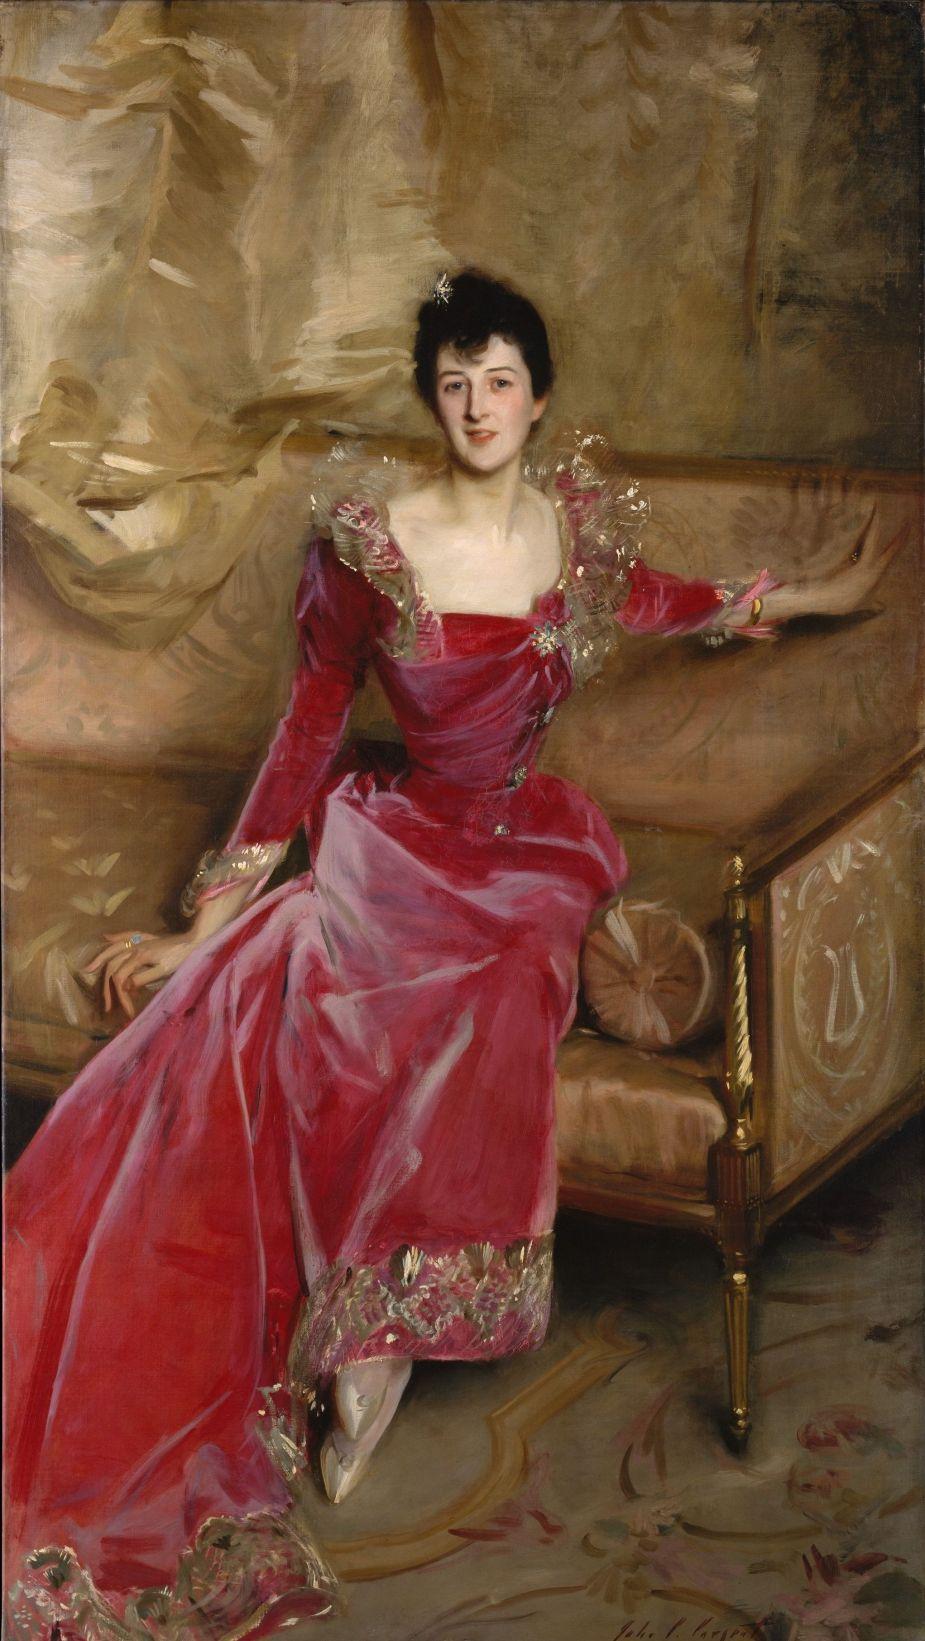 Mrs. Hugh Hammersley by John Singer Sargent